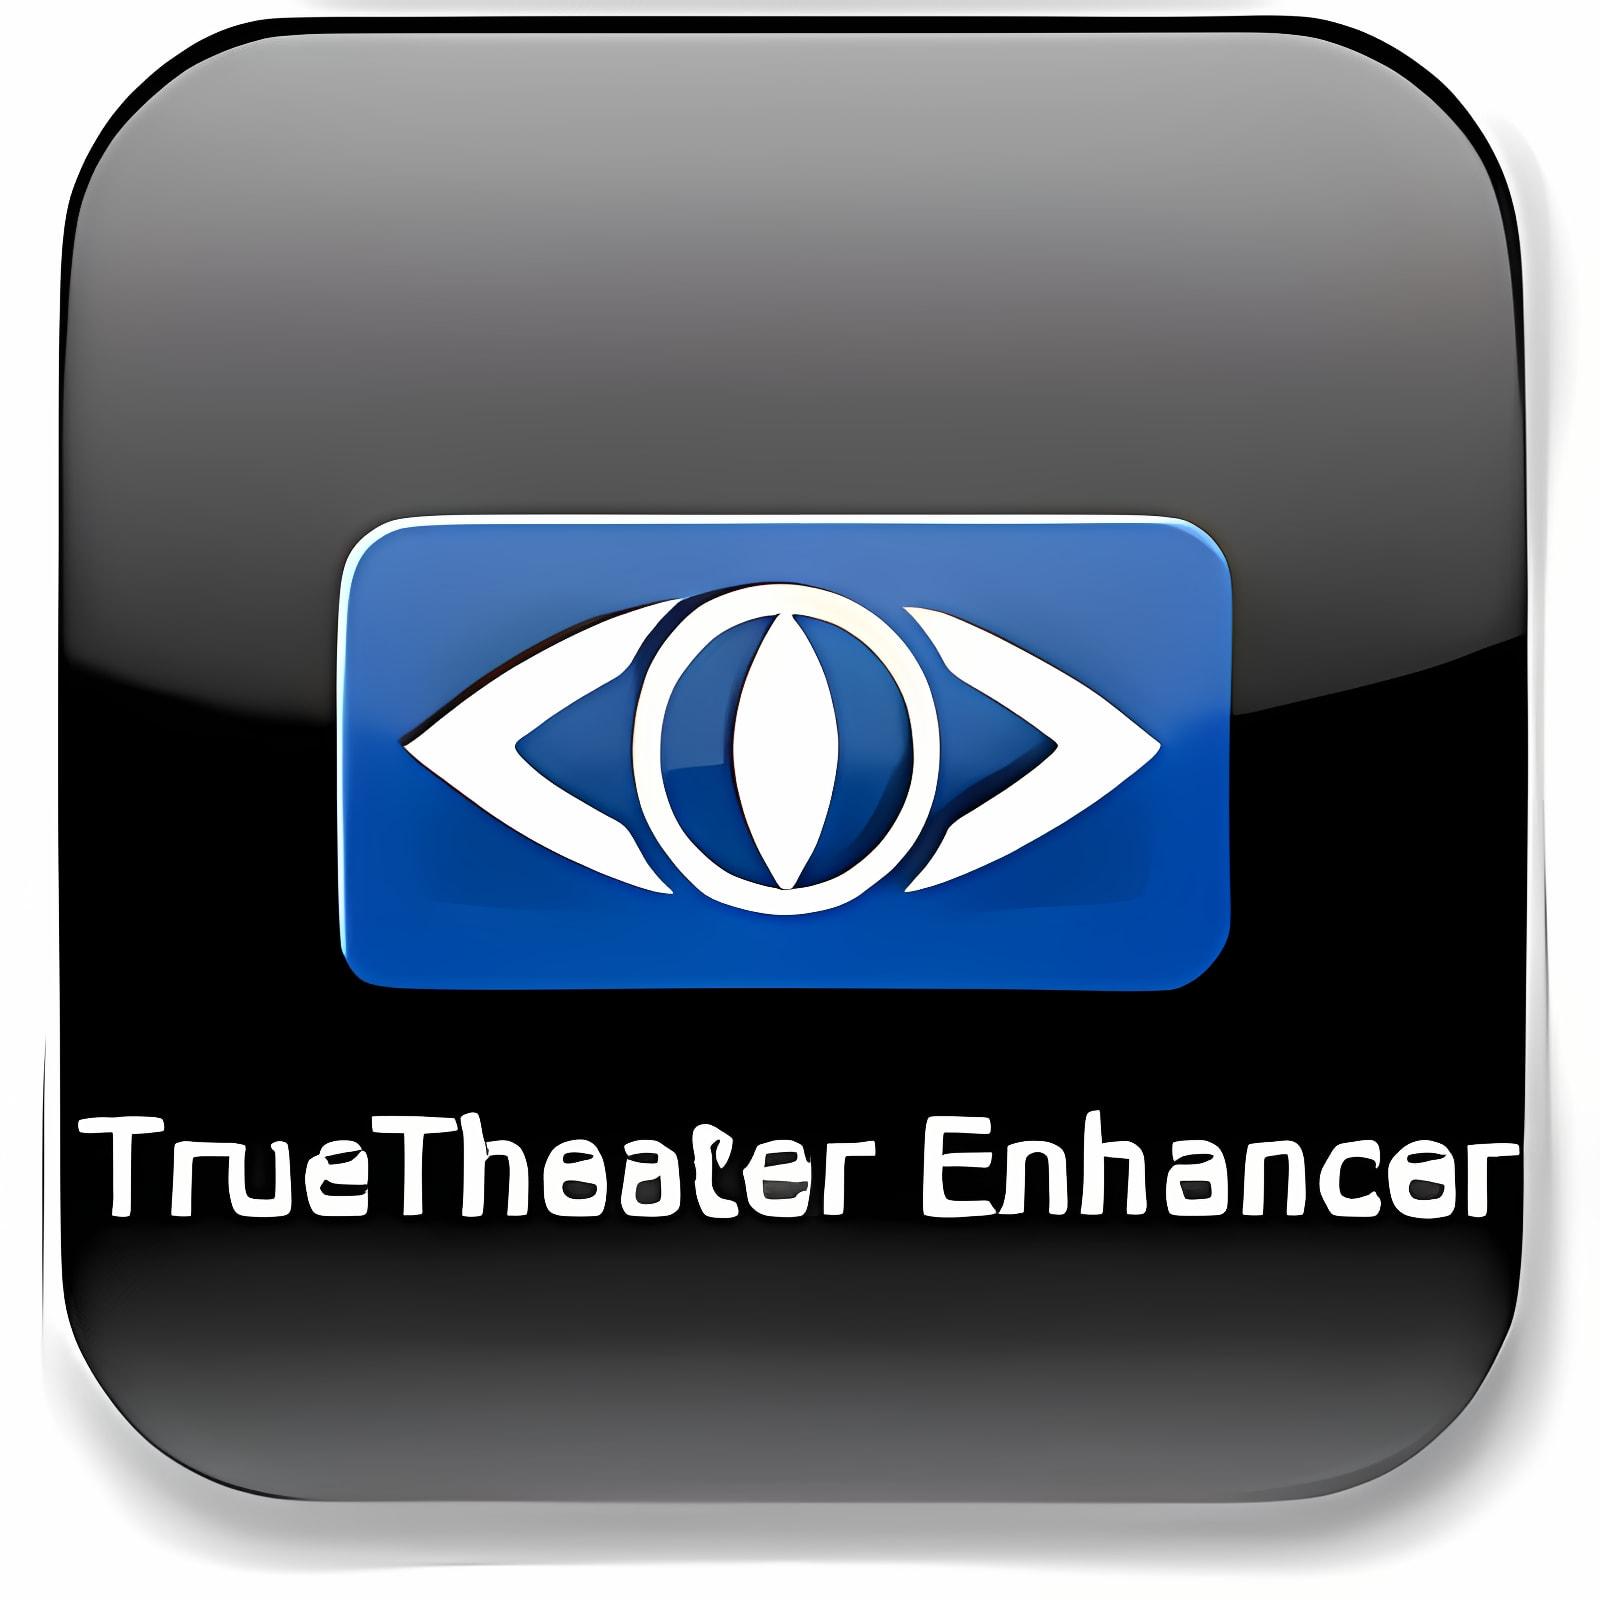 TrueTheater Enhancer